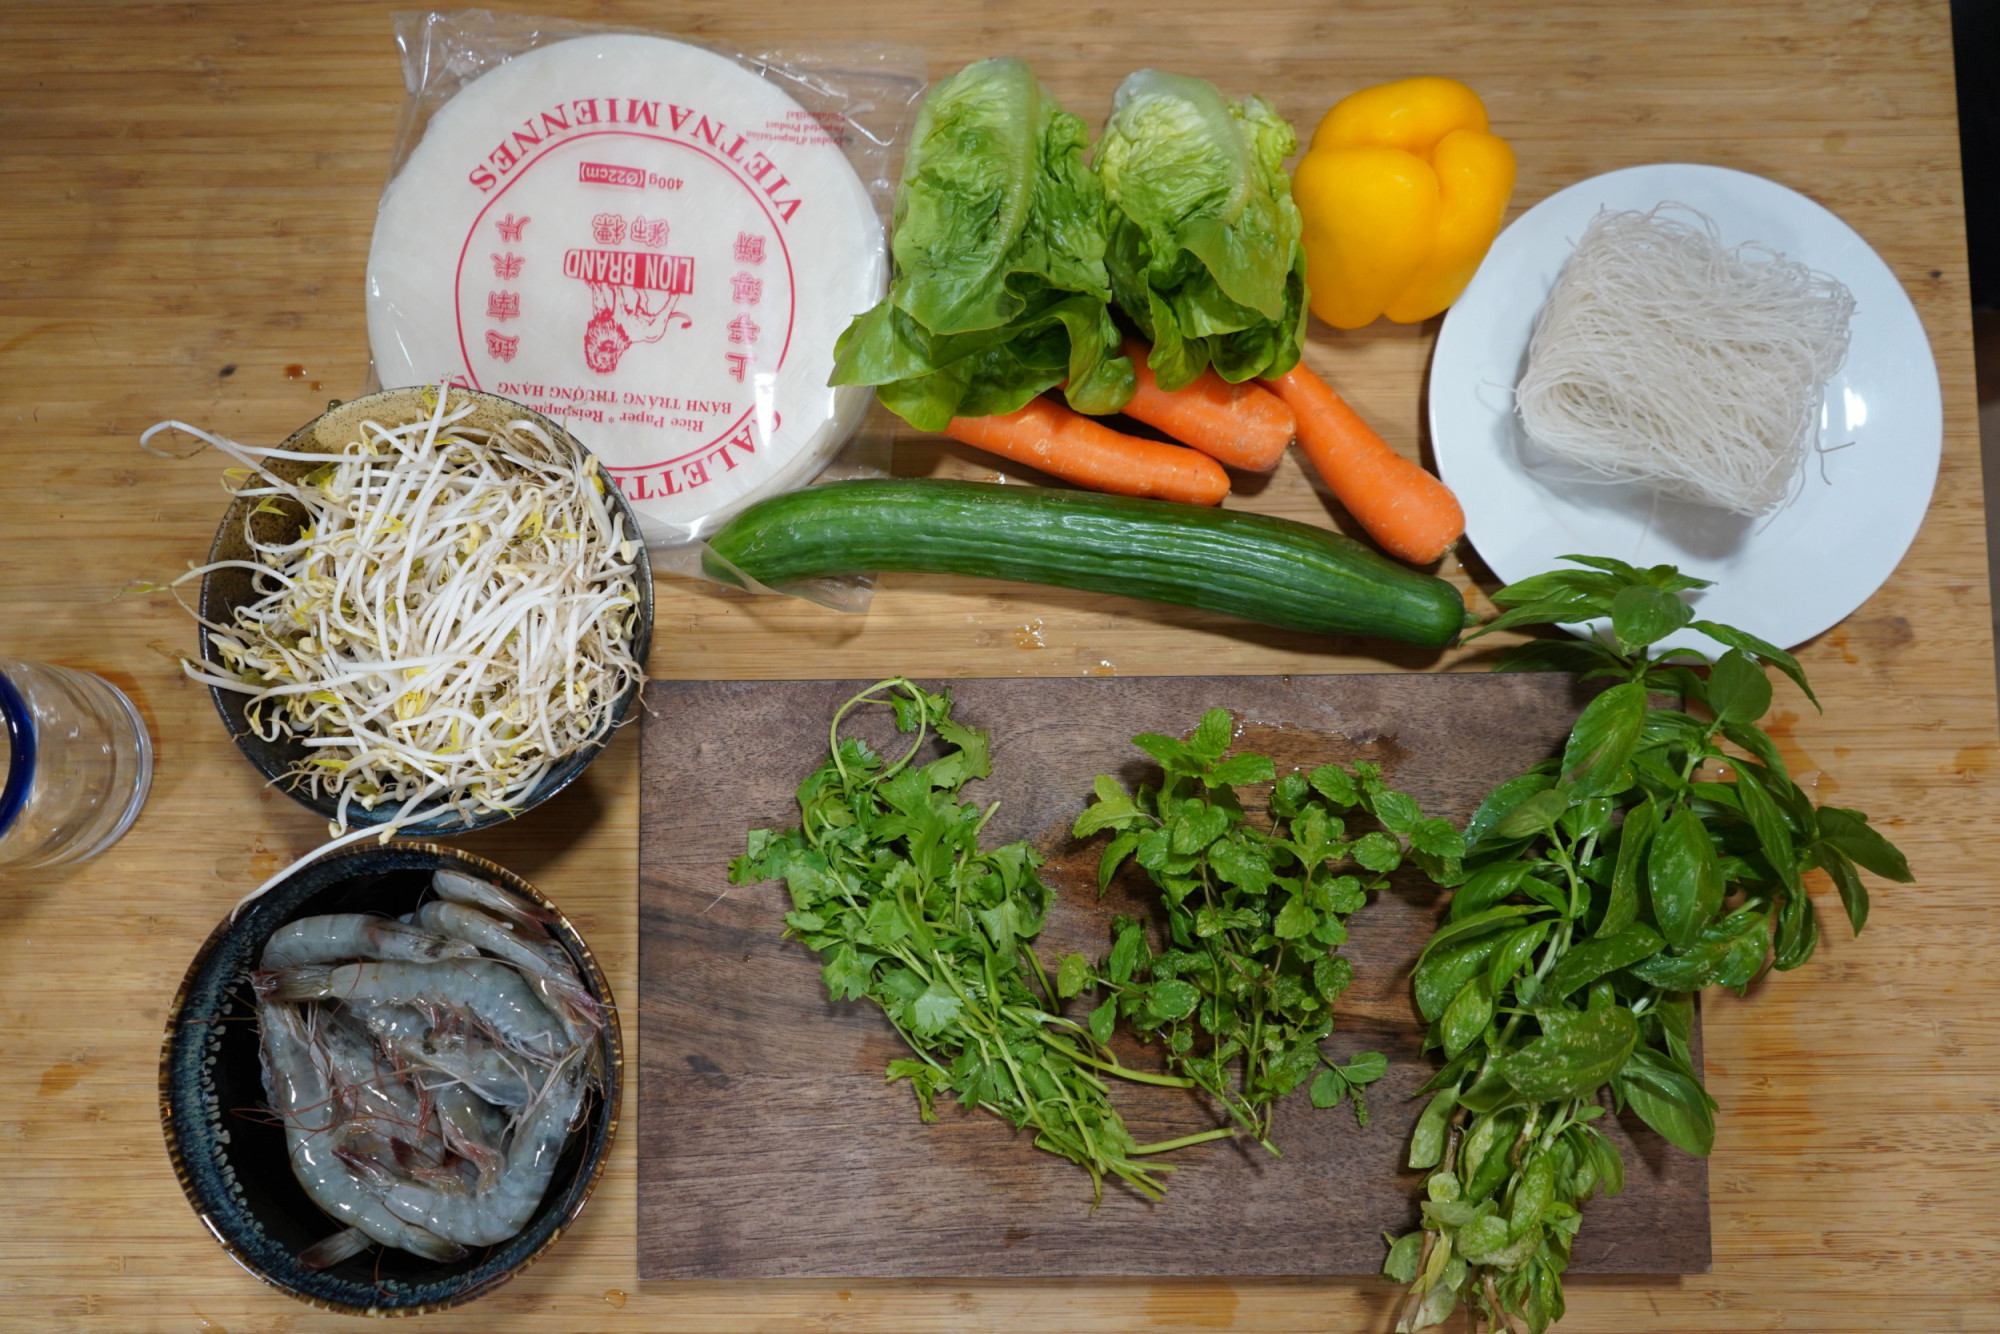 sumer rolls recipe preparation